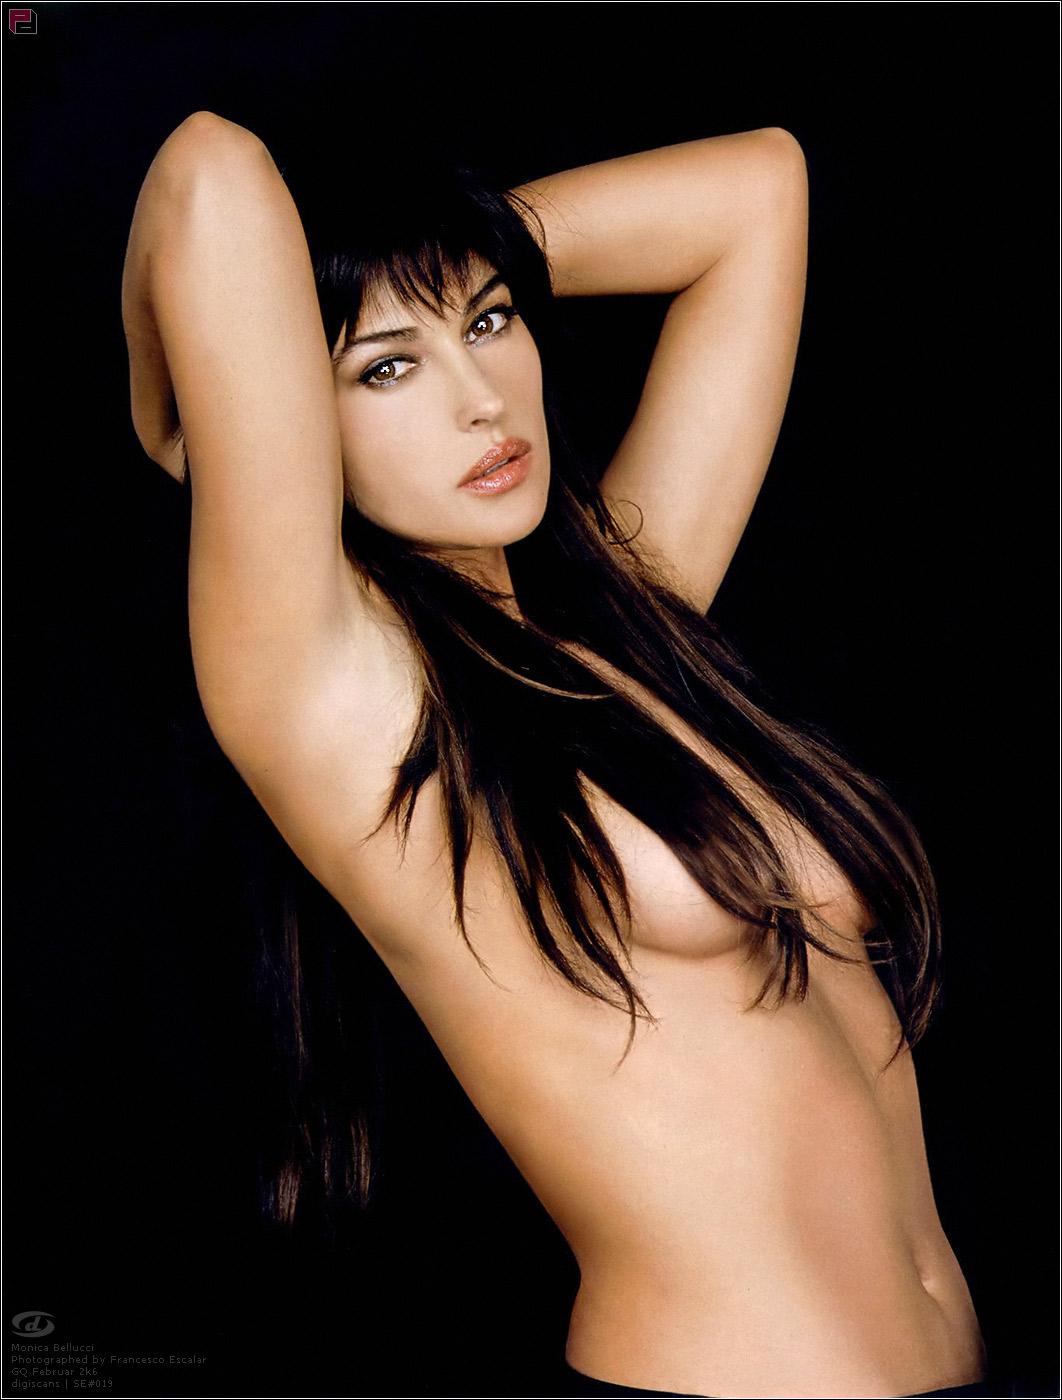 Image andsexy of undress jacklin hot